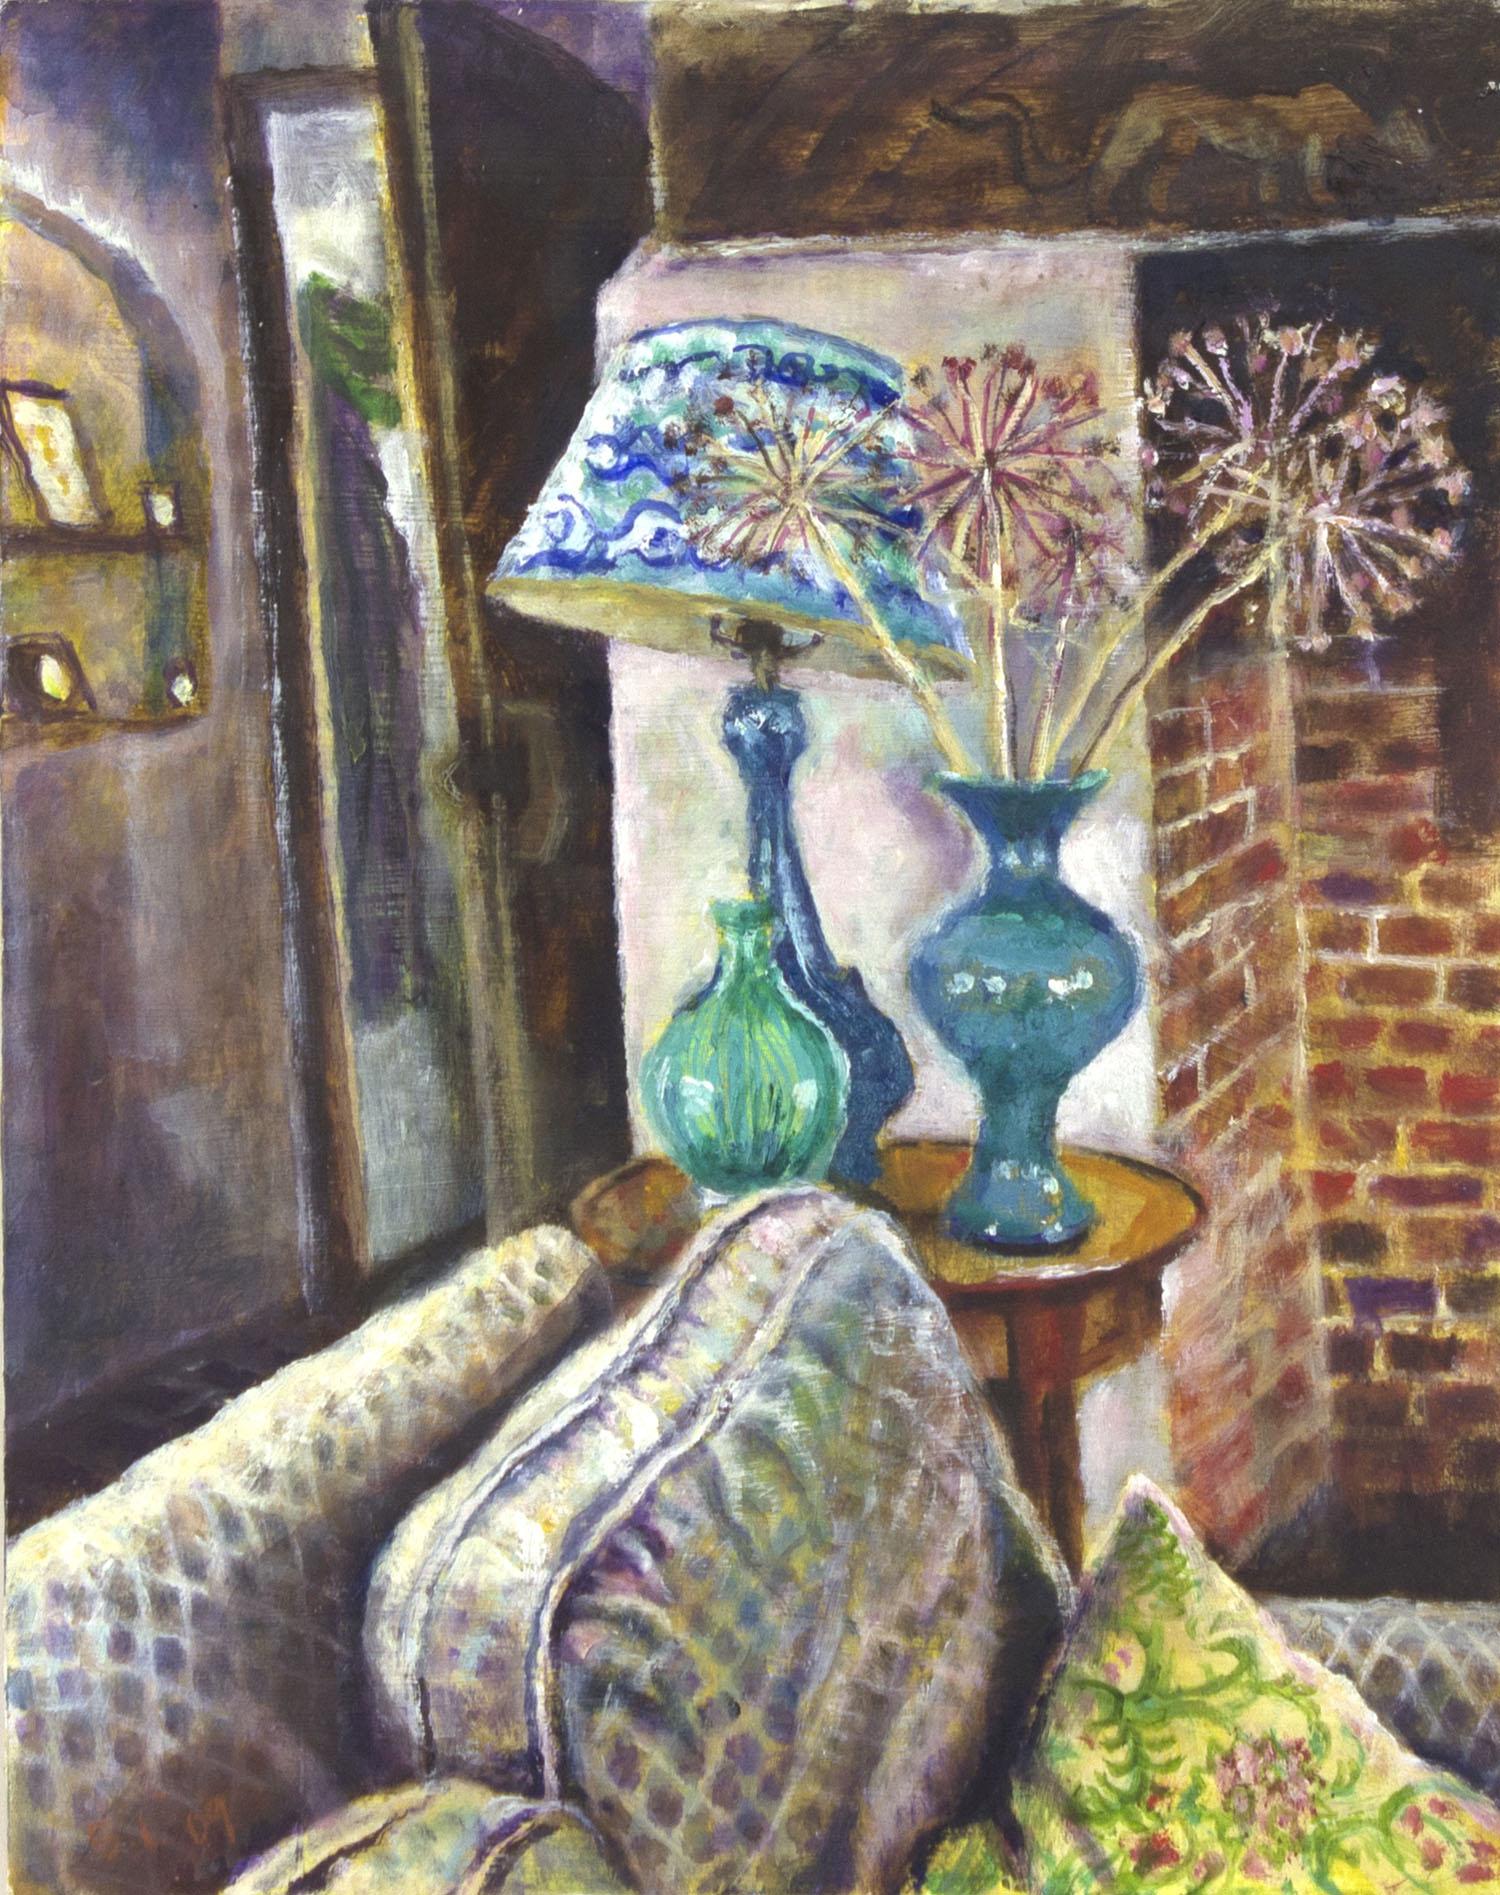 Sarah Longley 'Fireside' oil on board 35x28cm.jpg